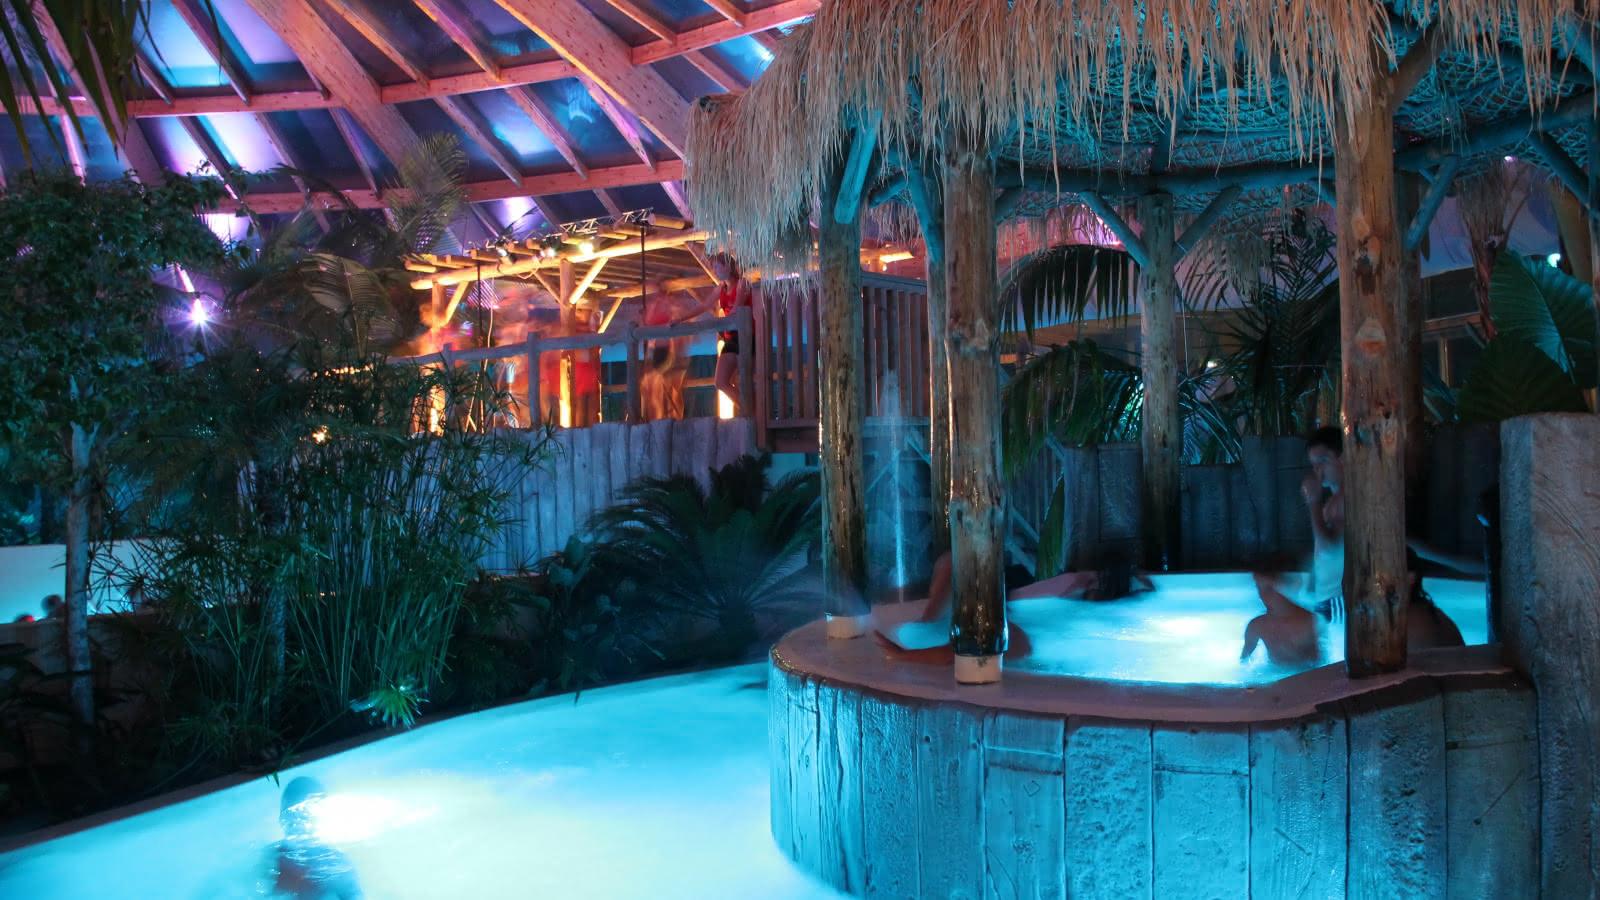 Parc aquatique-Aqualiday-Lacanau-aqualinight 2